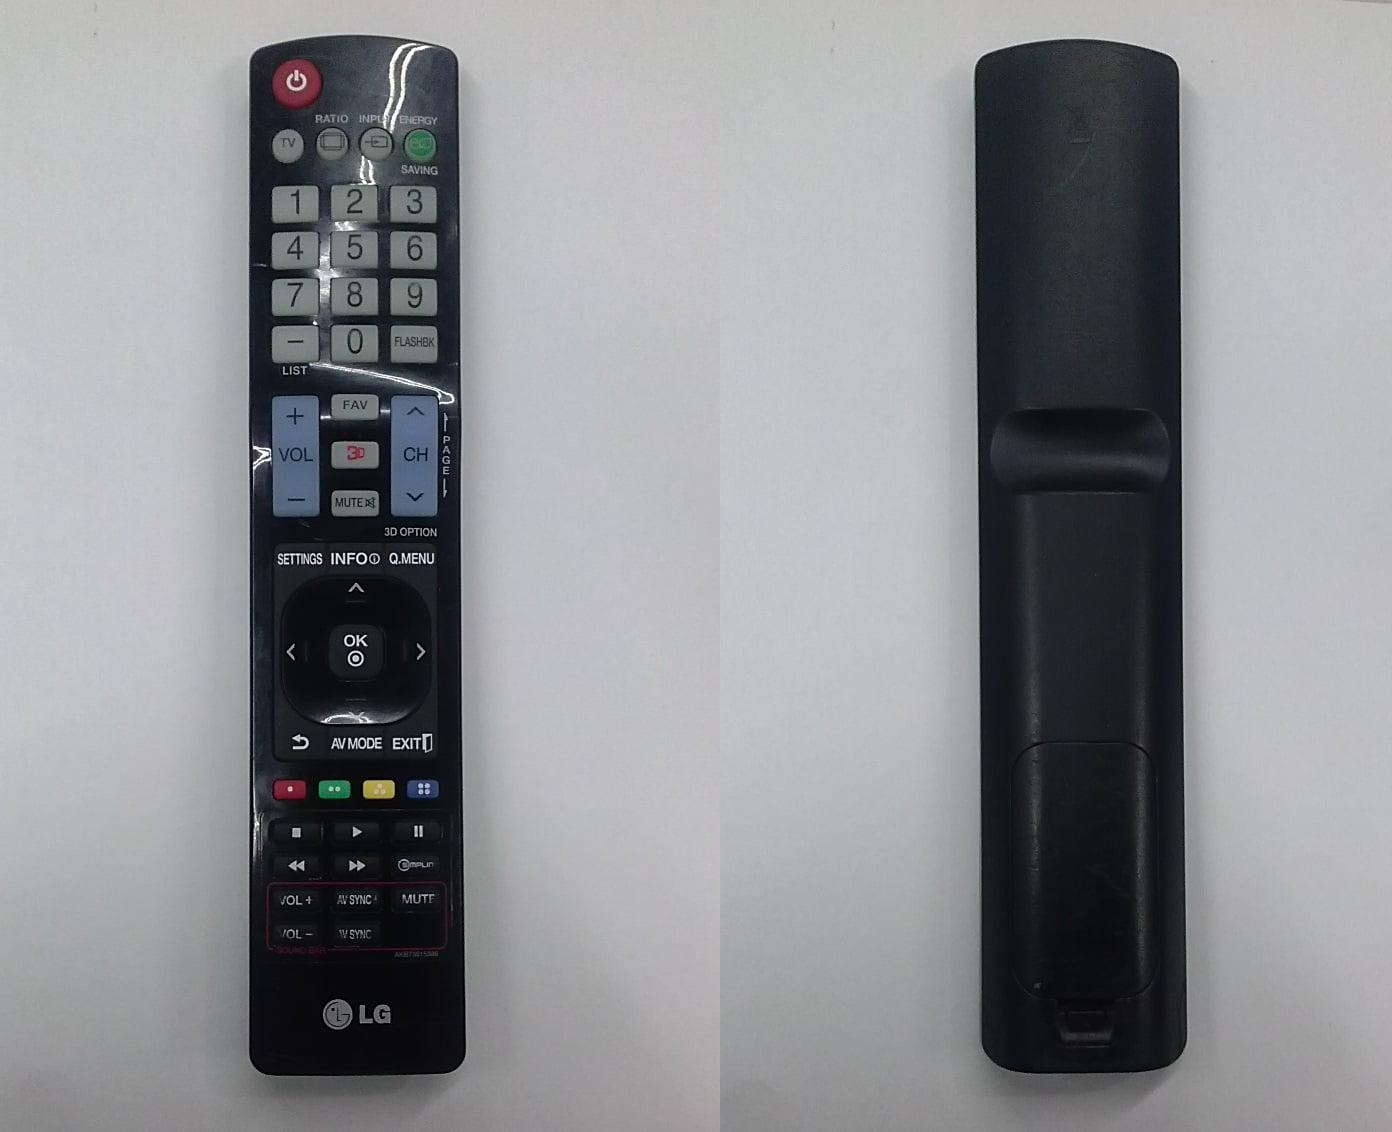 LG 42LM3700 TV WINDOWS 7 DRIVER